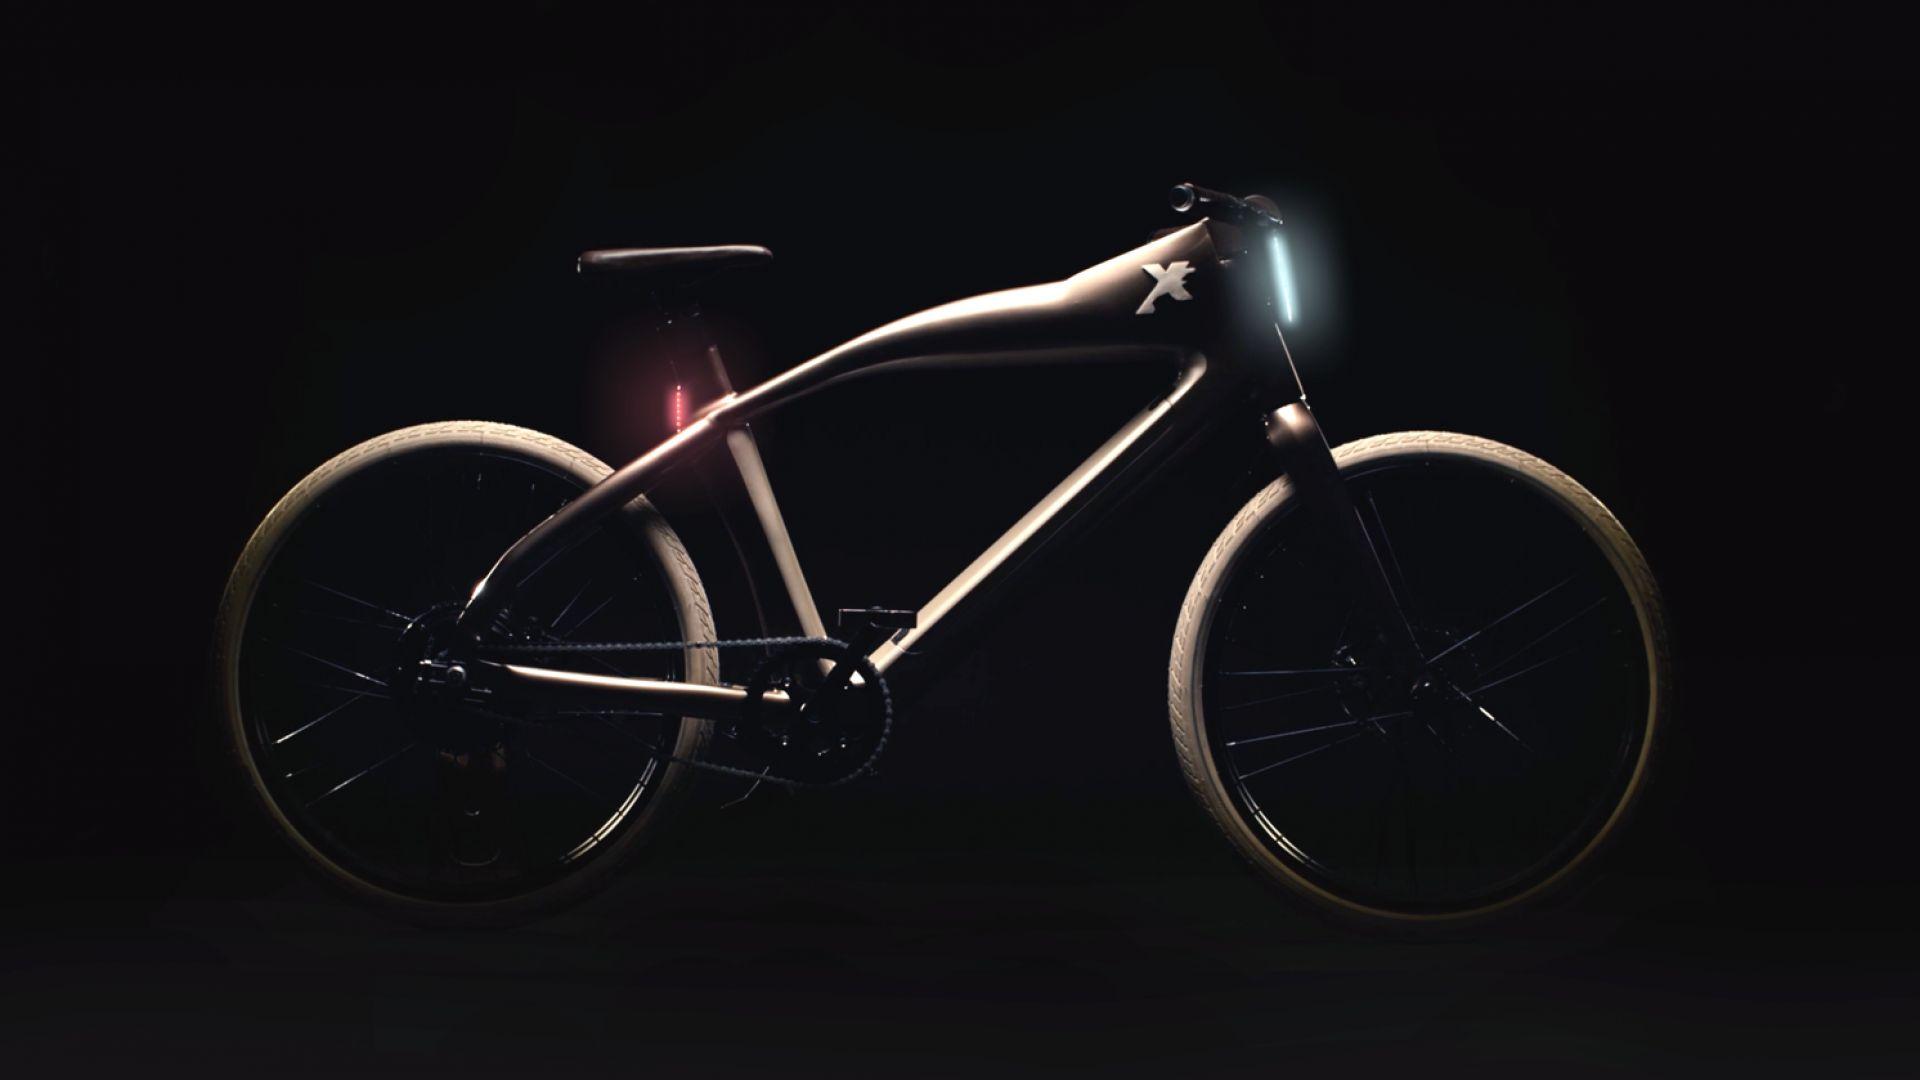 Електрически велосипед разпознава лица